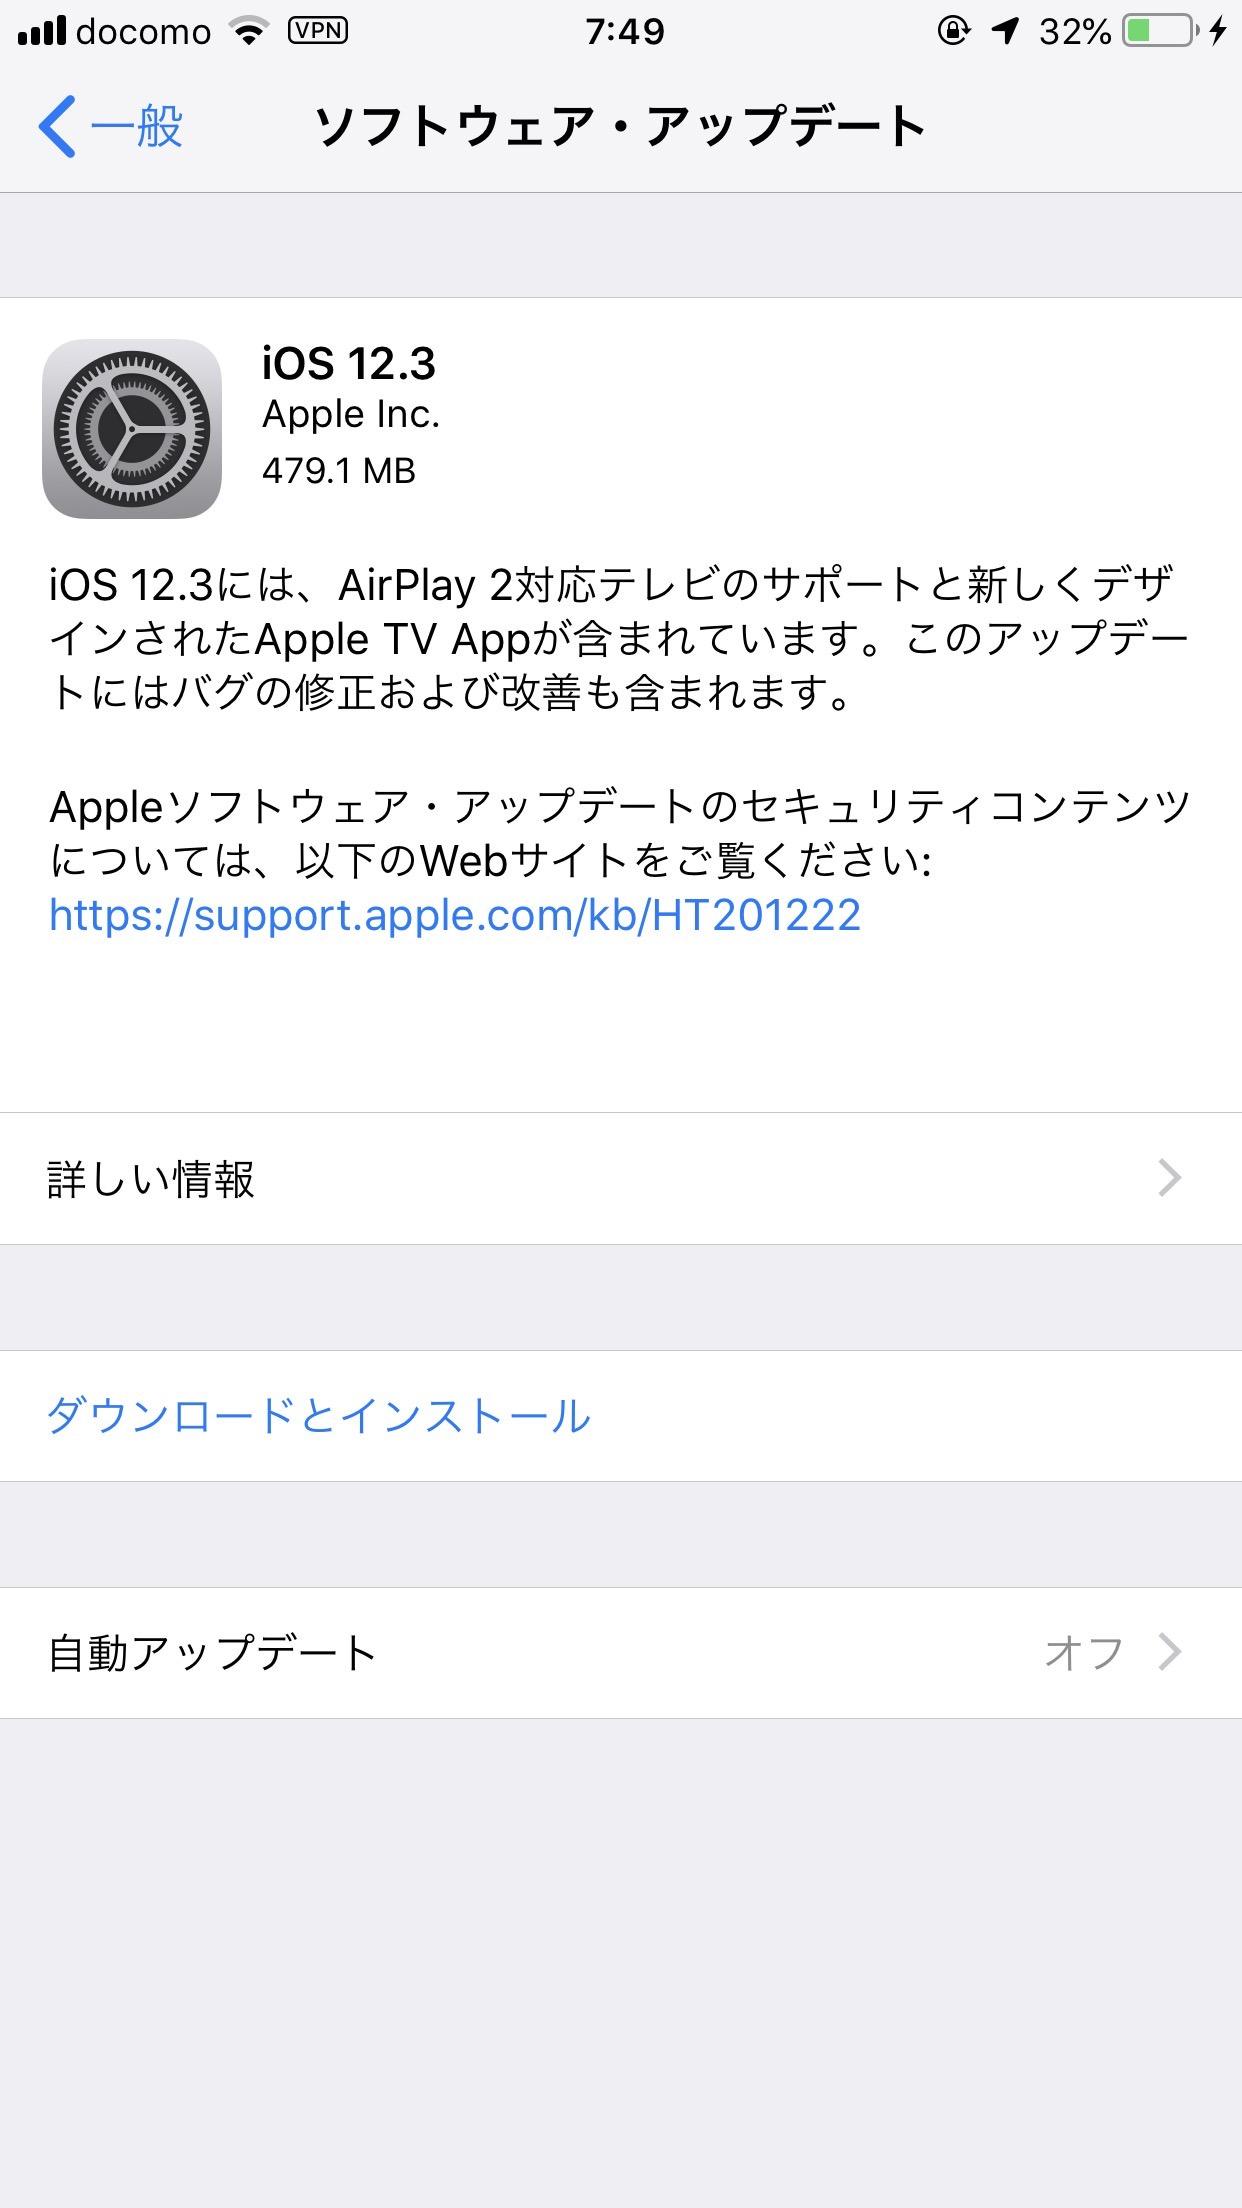 【iOS 12】「iOS 12.3ソフトウェアアップデート」リリース 〜IIJmio問題なし